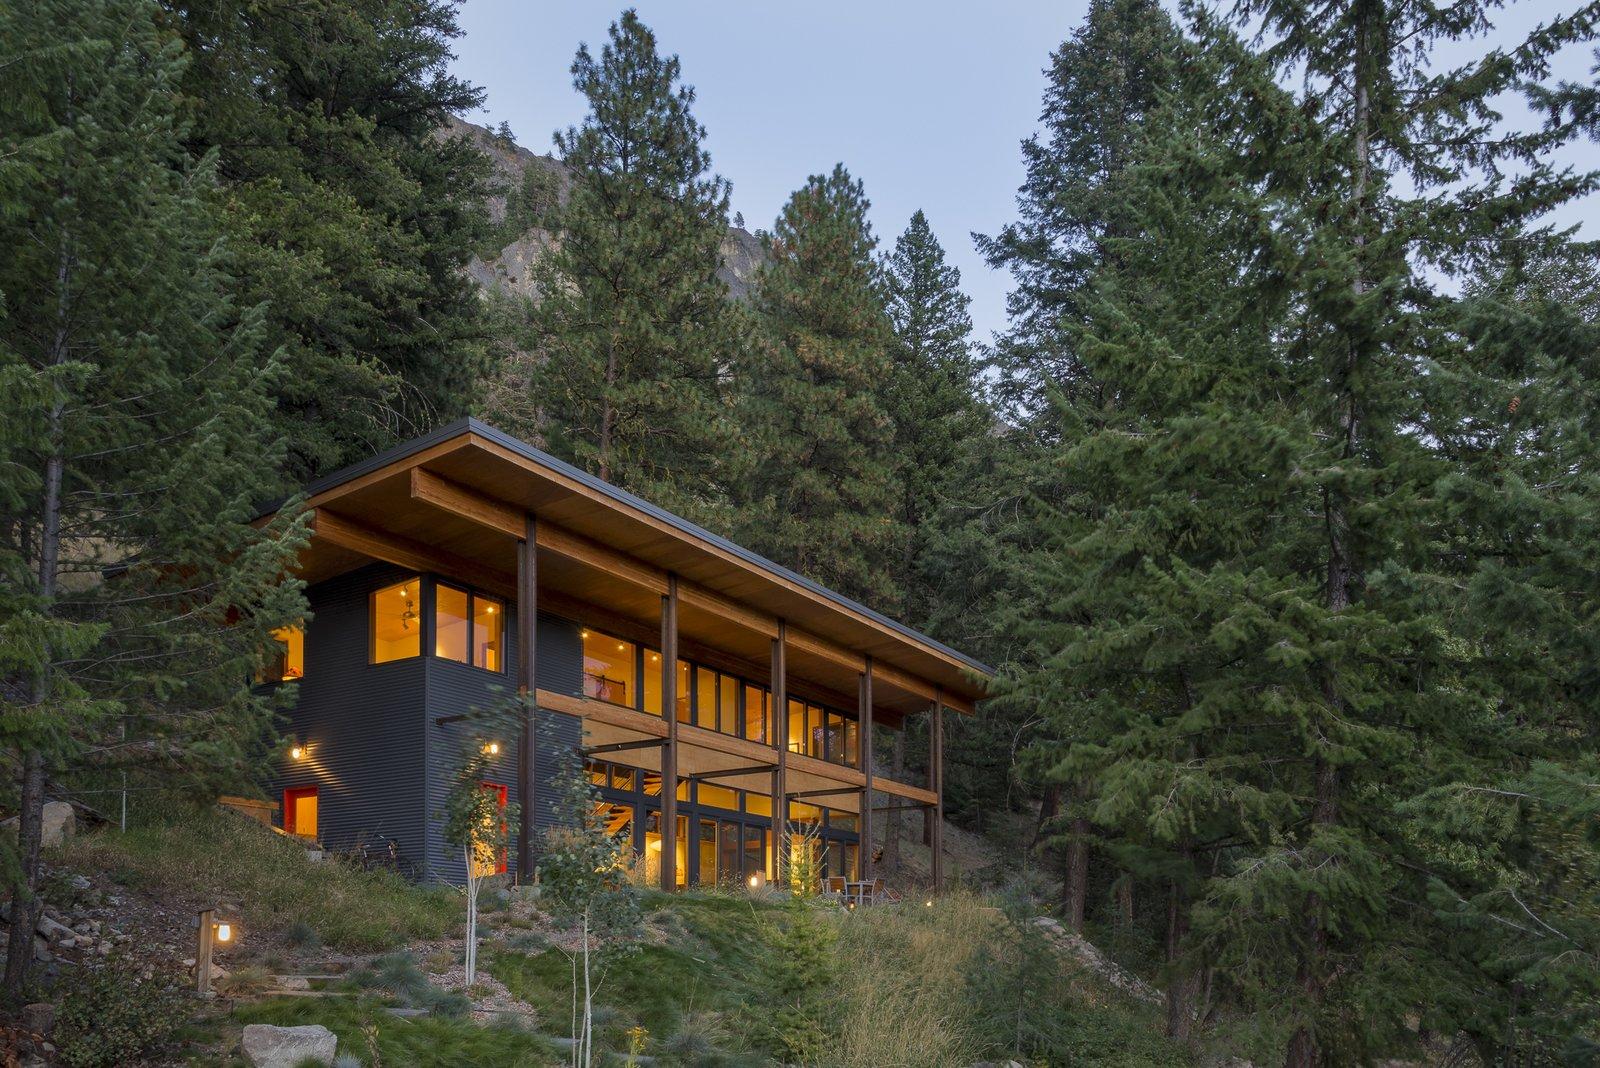 Articles about modern mountain retreat washington on Dwell.com